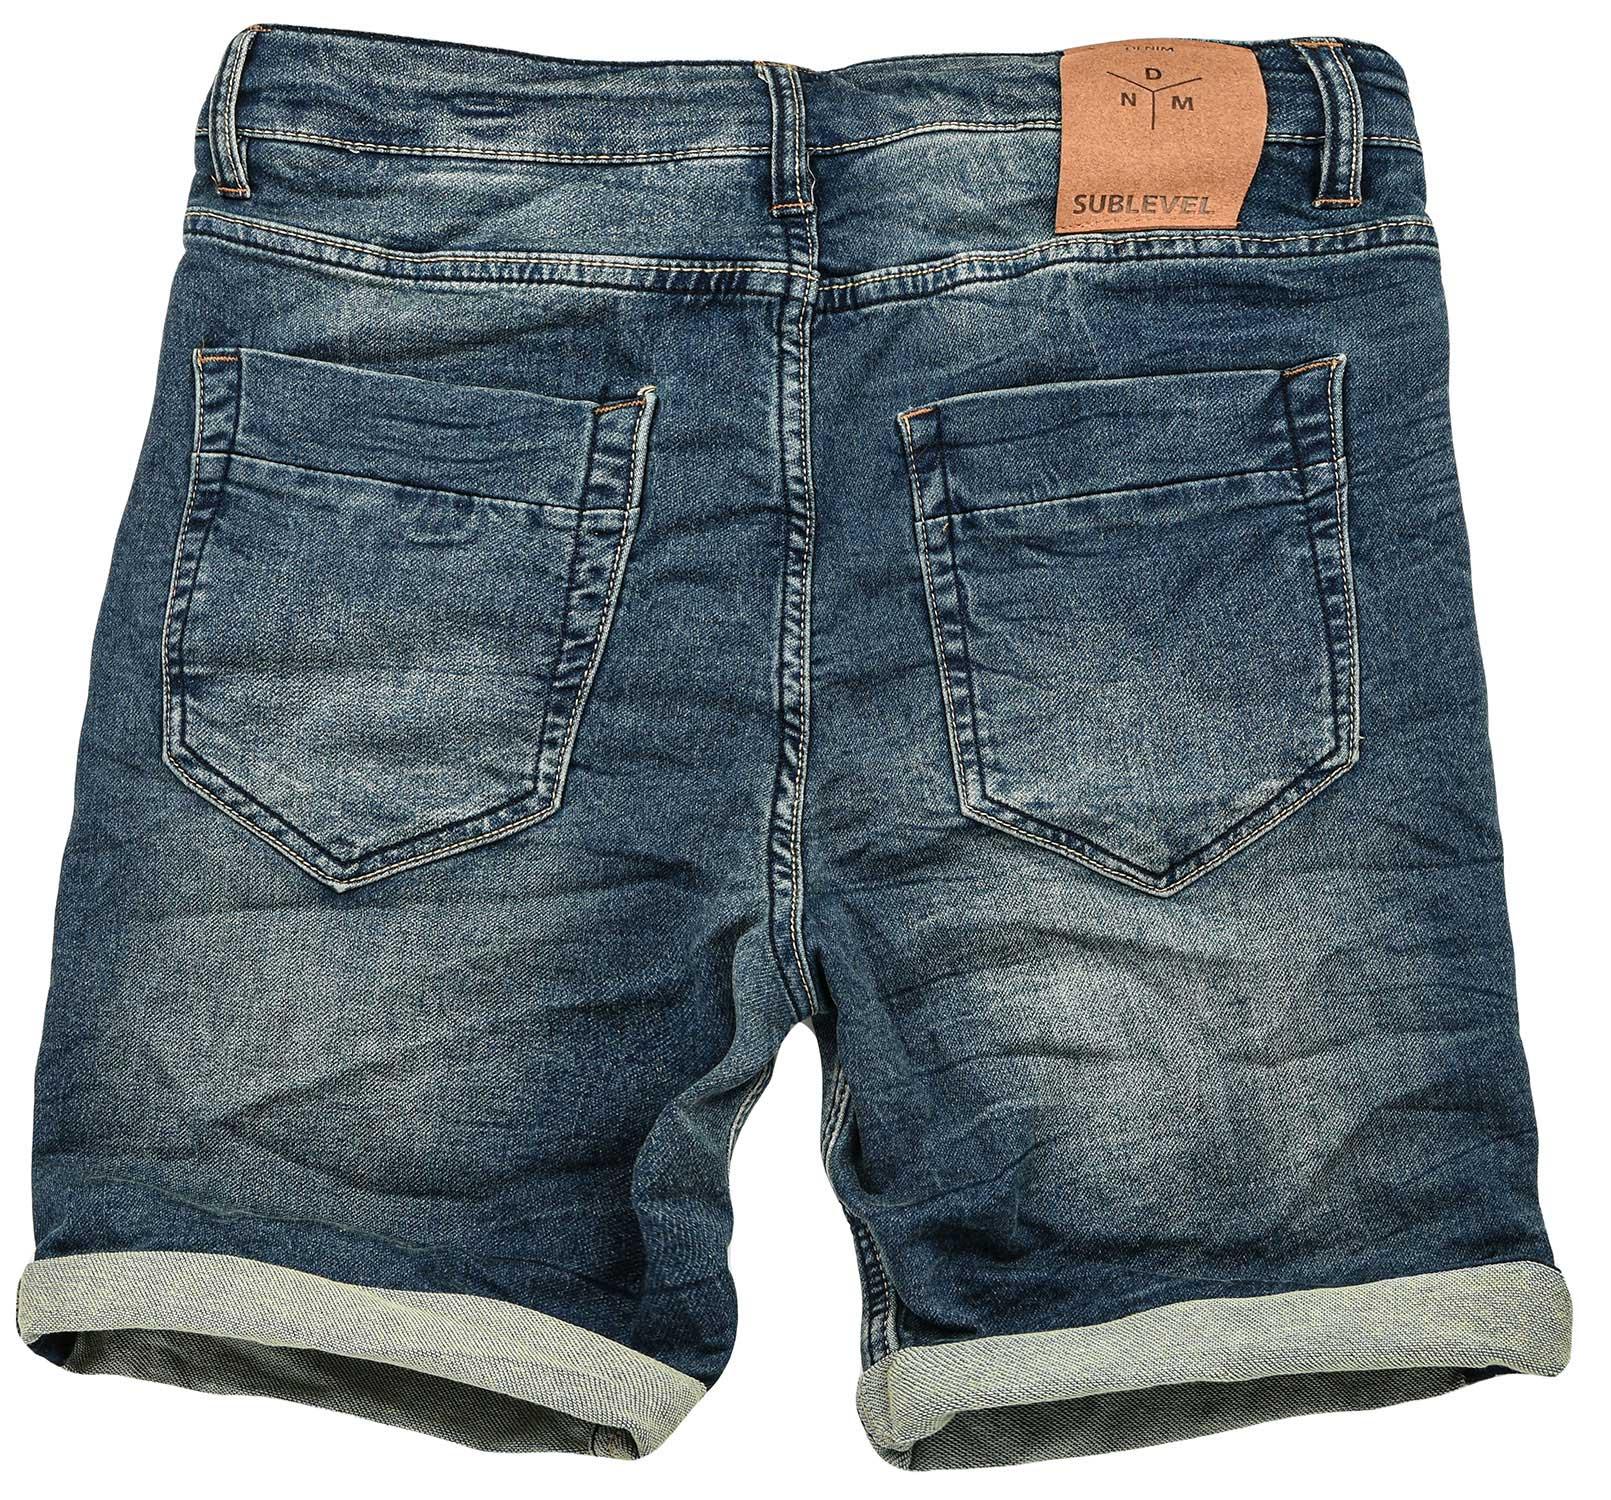 Sublevel-Herren-Sweat-Jeans-Shorts-kurze-Hose-Bermuda-Sommer-Sweathose-Slim-NEU Indexbild 50